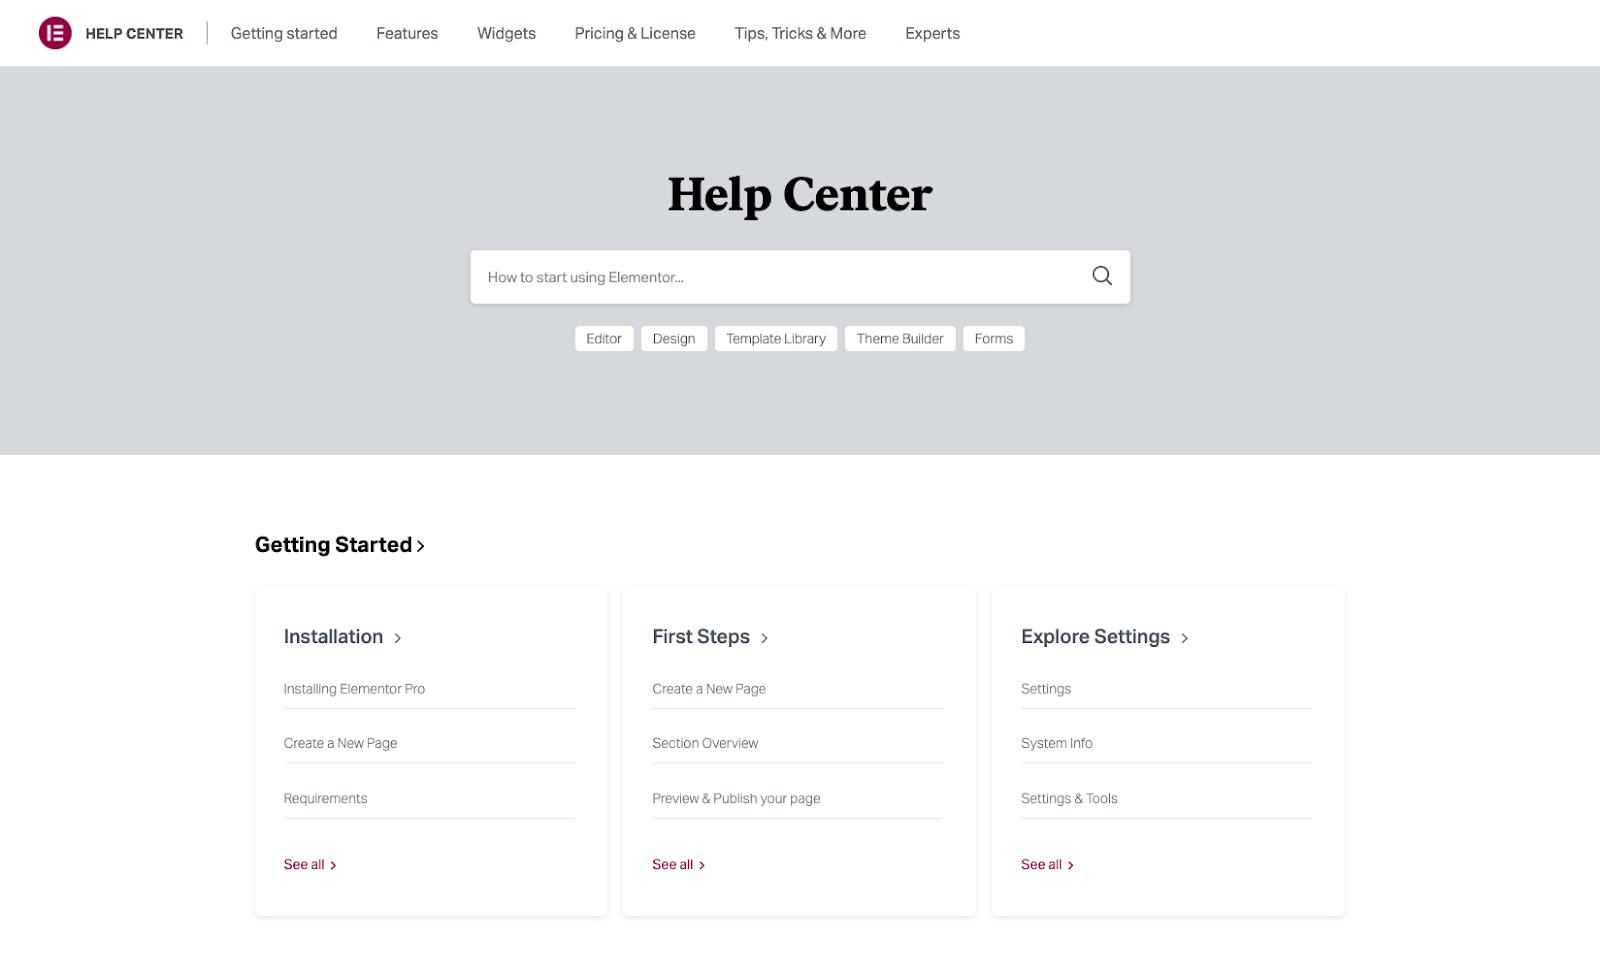 Elementor's comprehensive Help Center